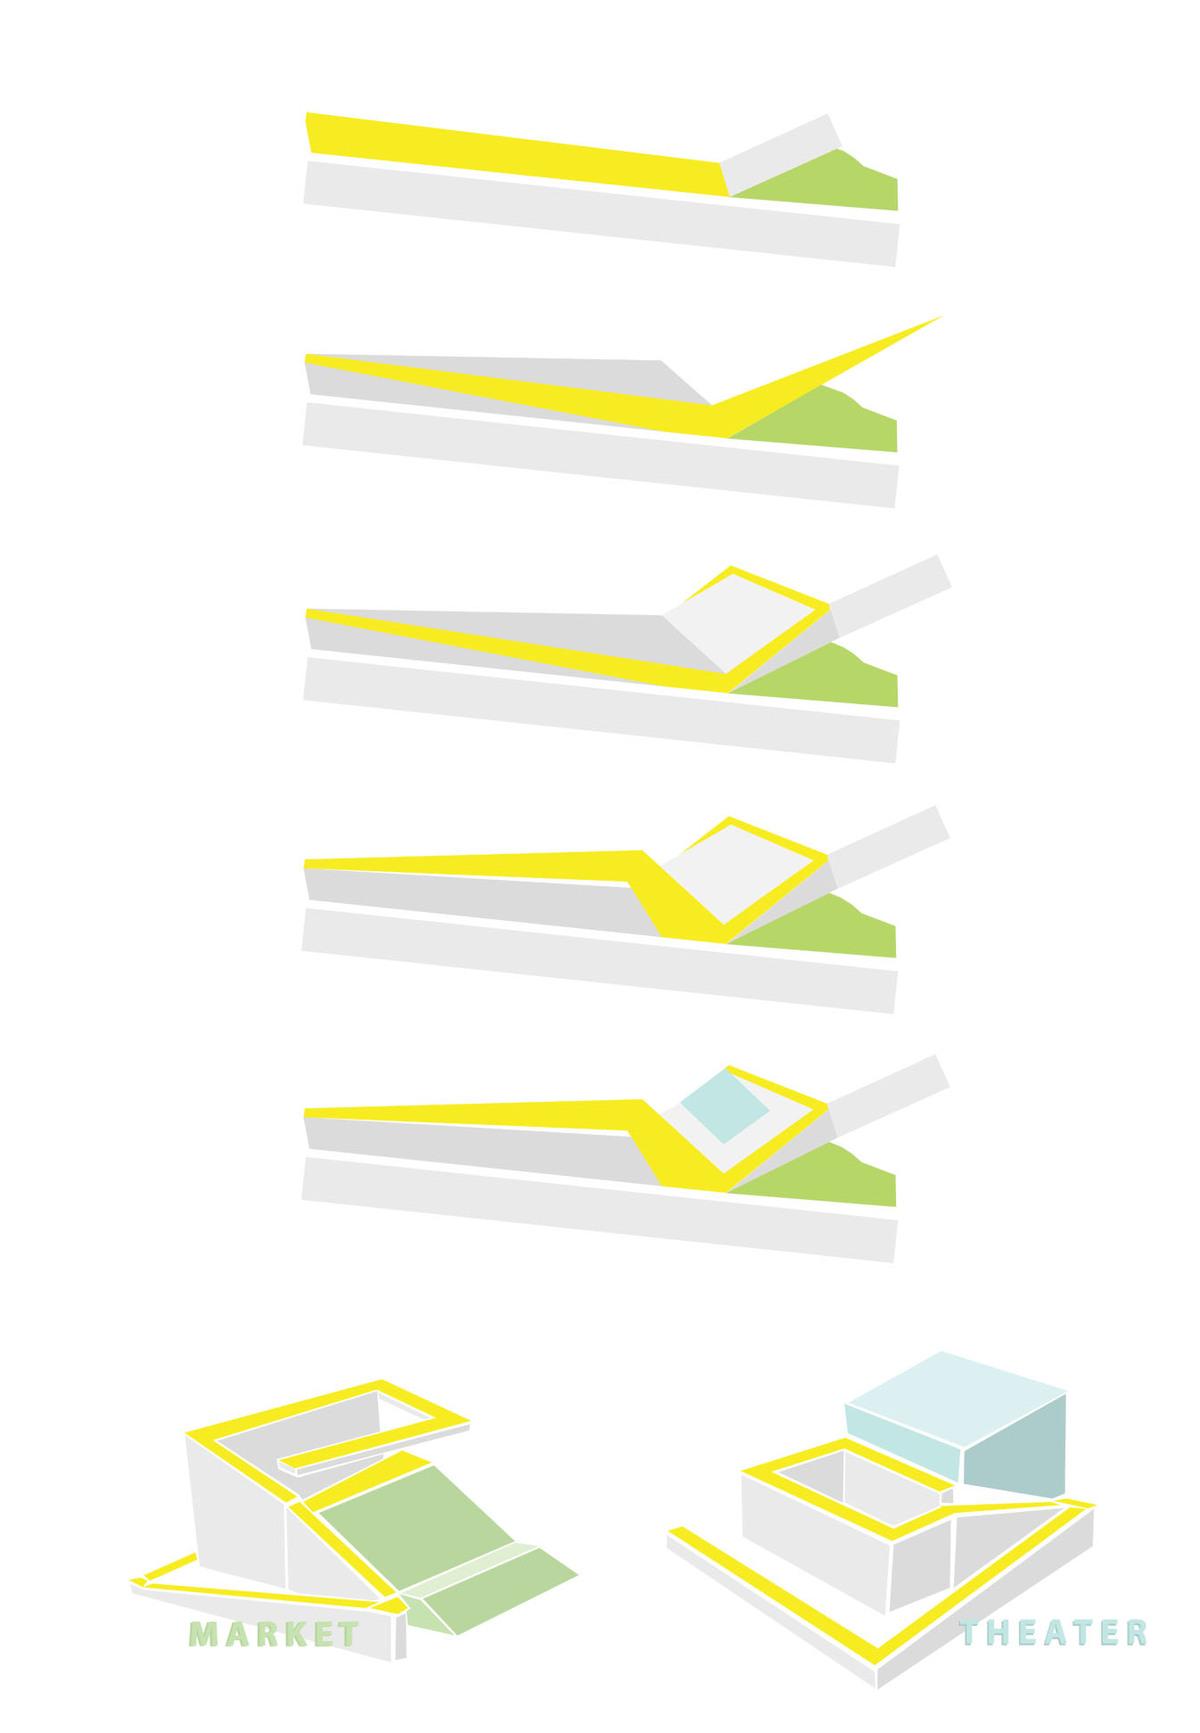 development of path and program diagrams